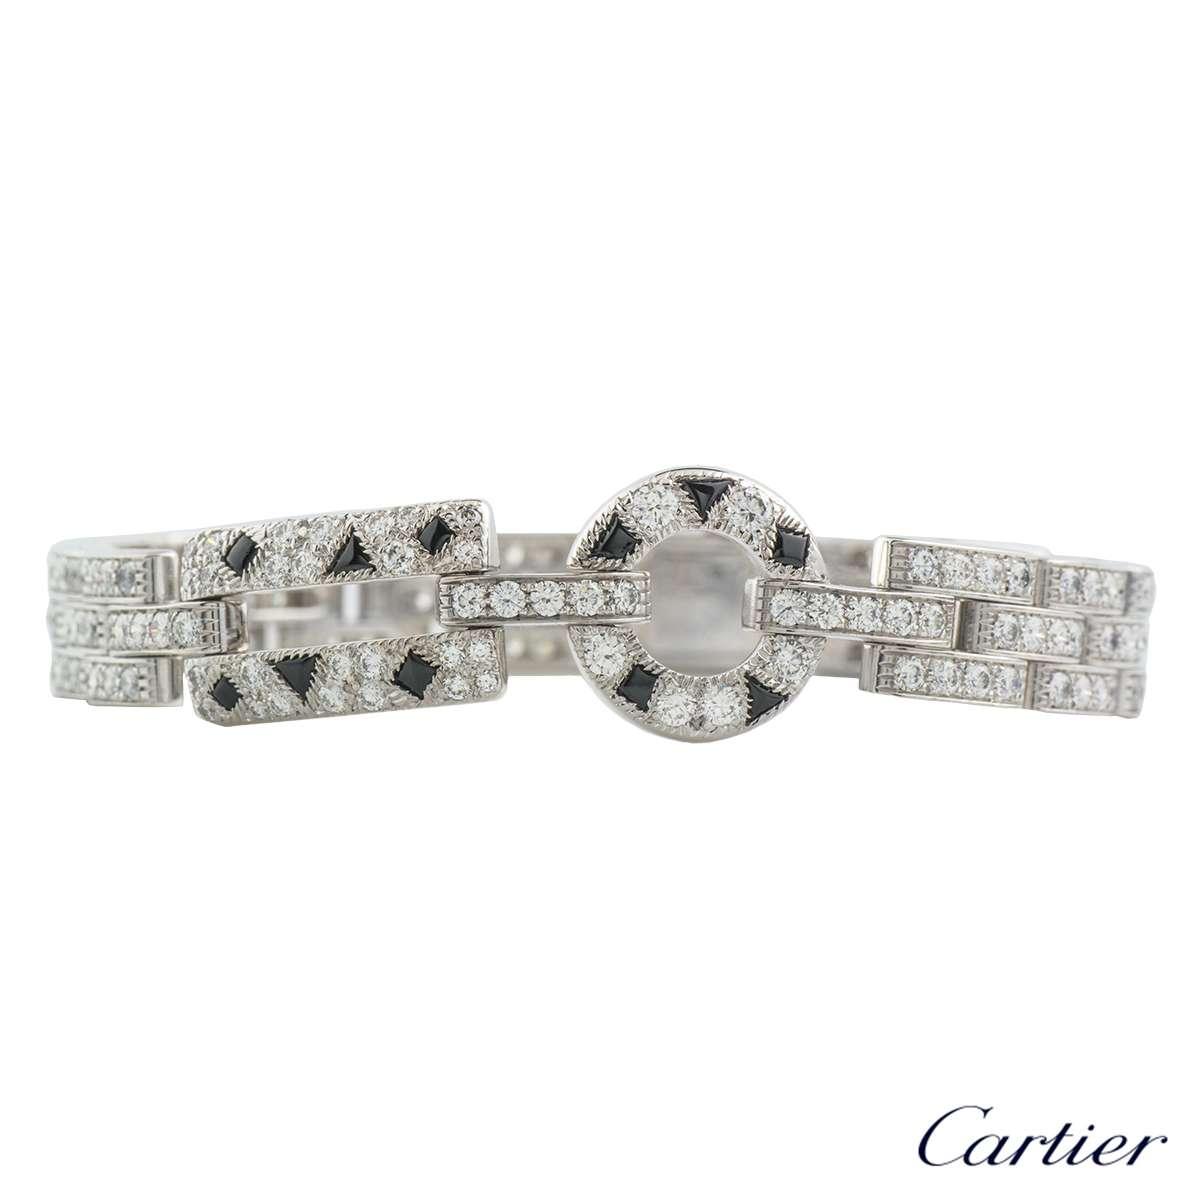 Cartier Infinity Bracelet: Cartier Panthere De Cartier Diamond & Onyx Bracelet